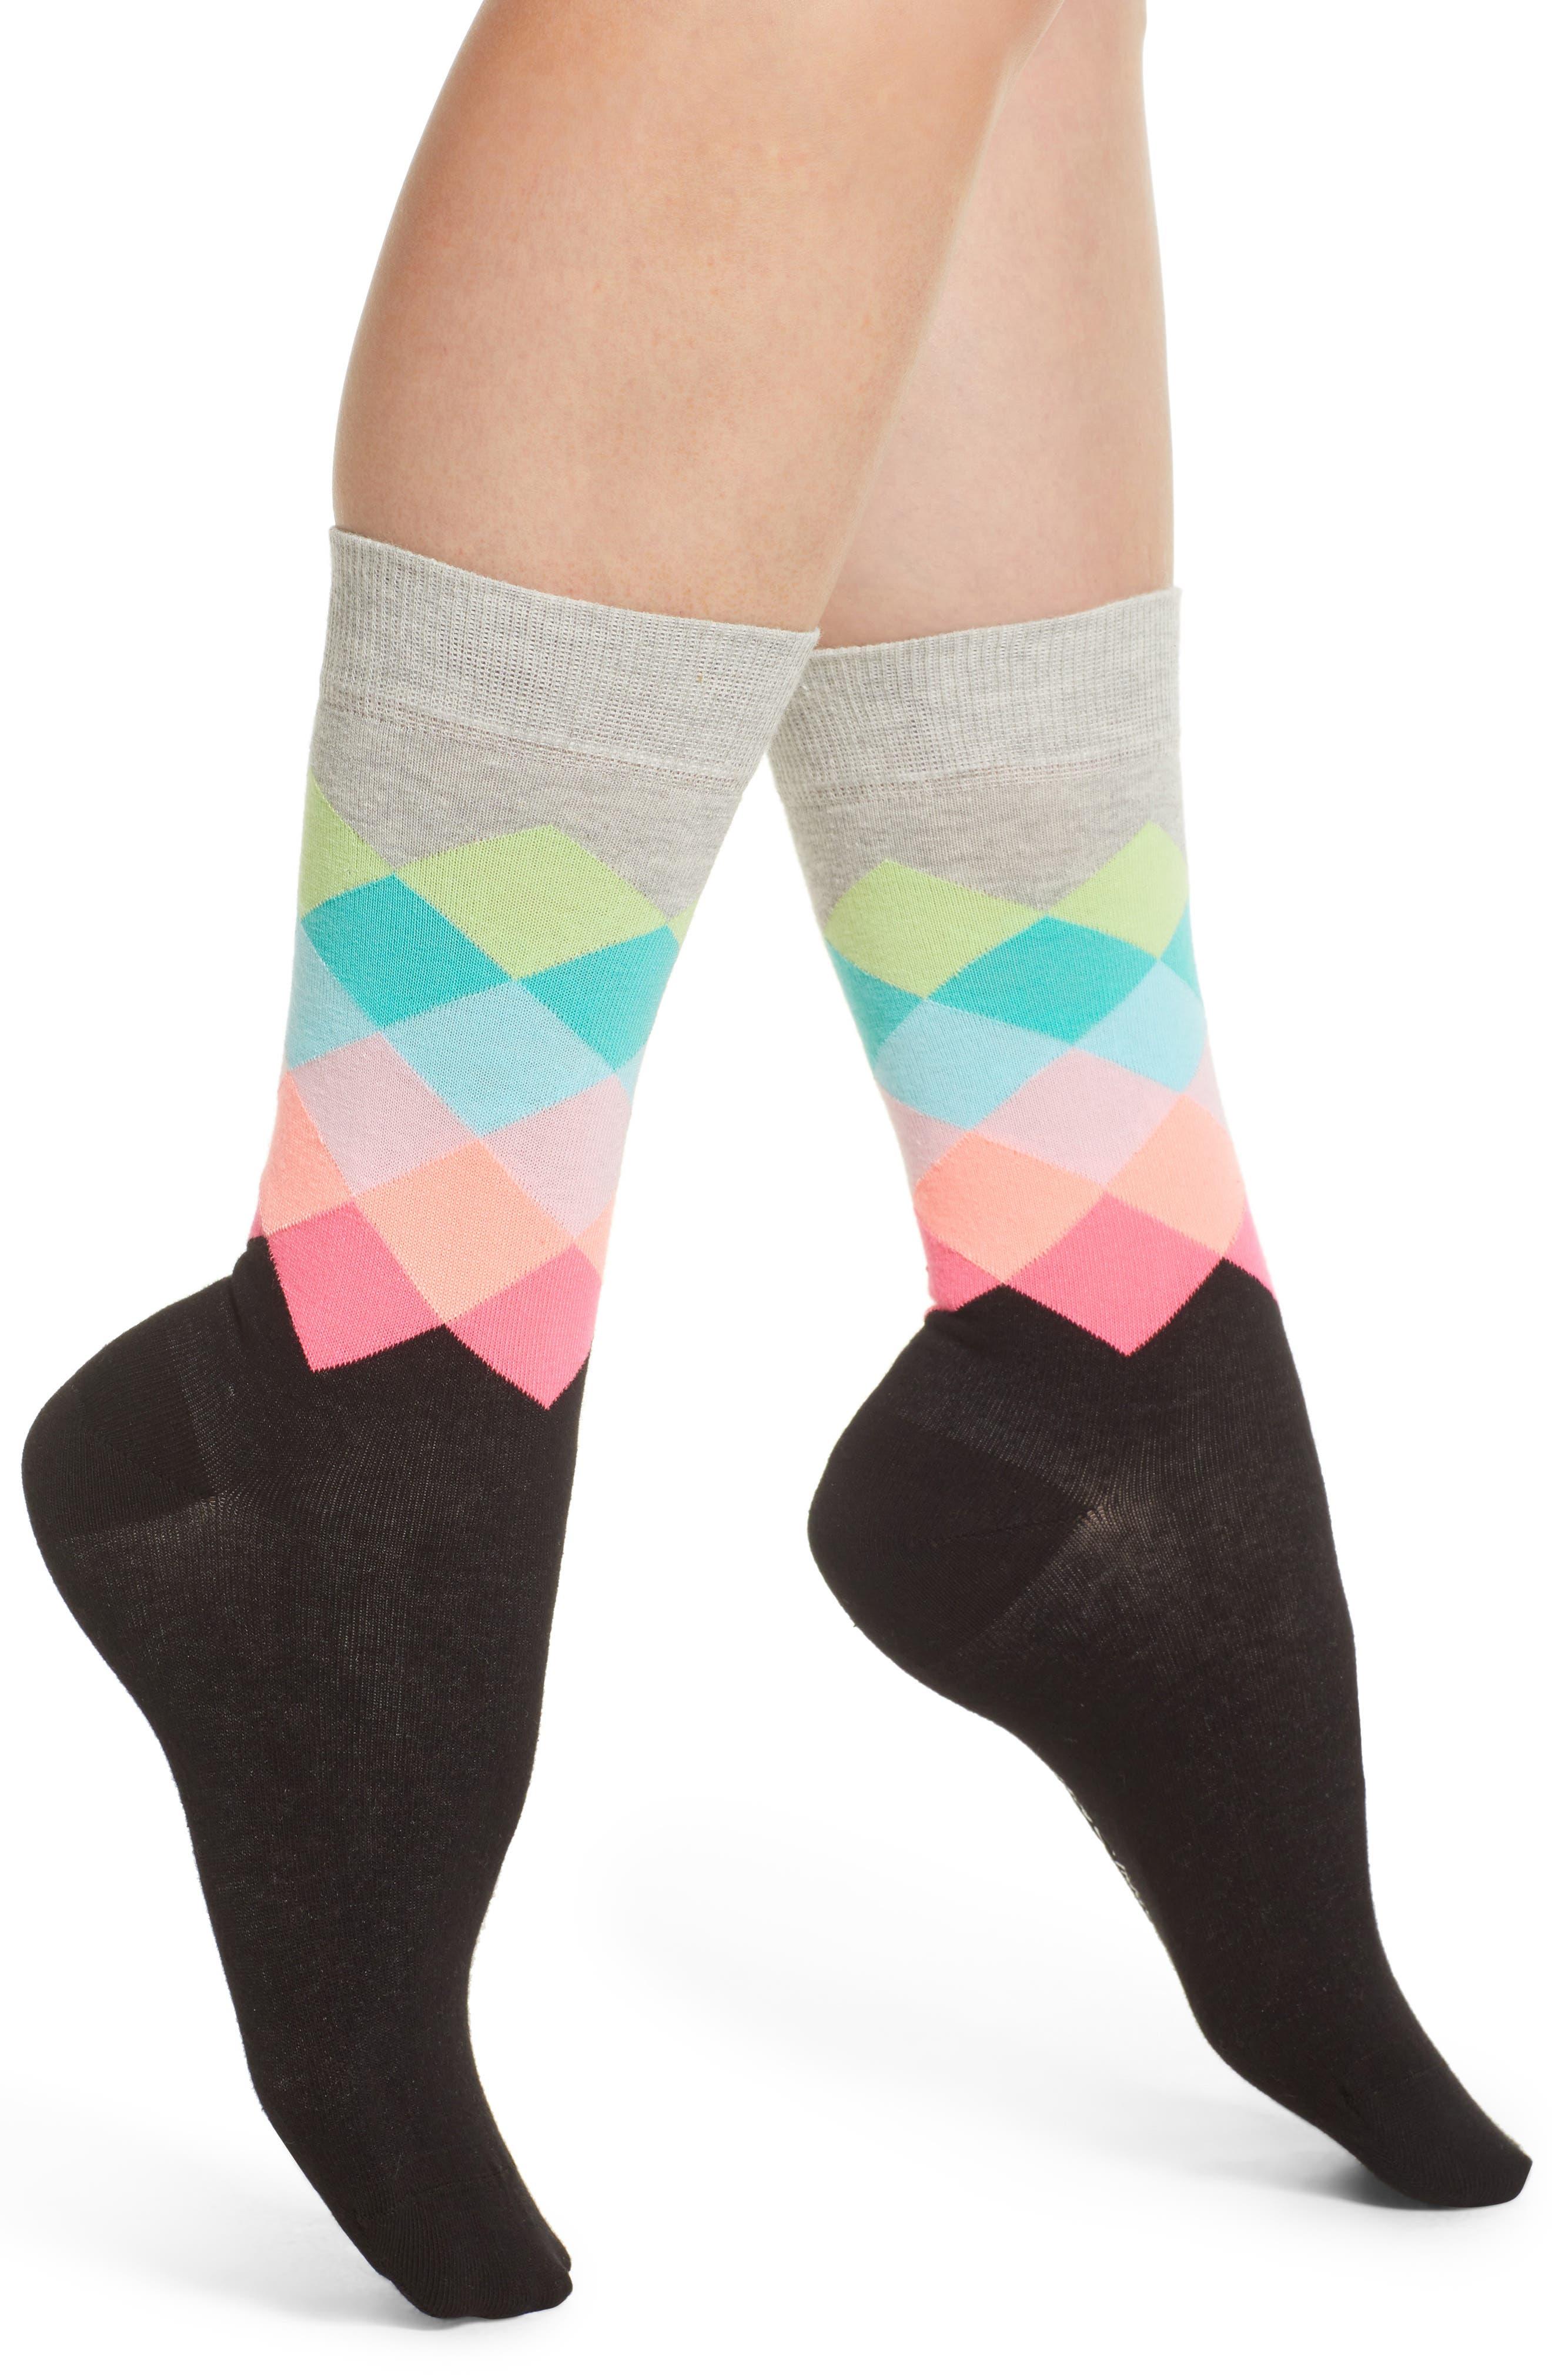 Faded Diamond Crew Socks,                             Main thumbnail 1, color,                             Blk/ Bright